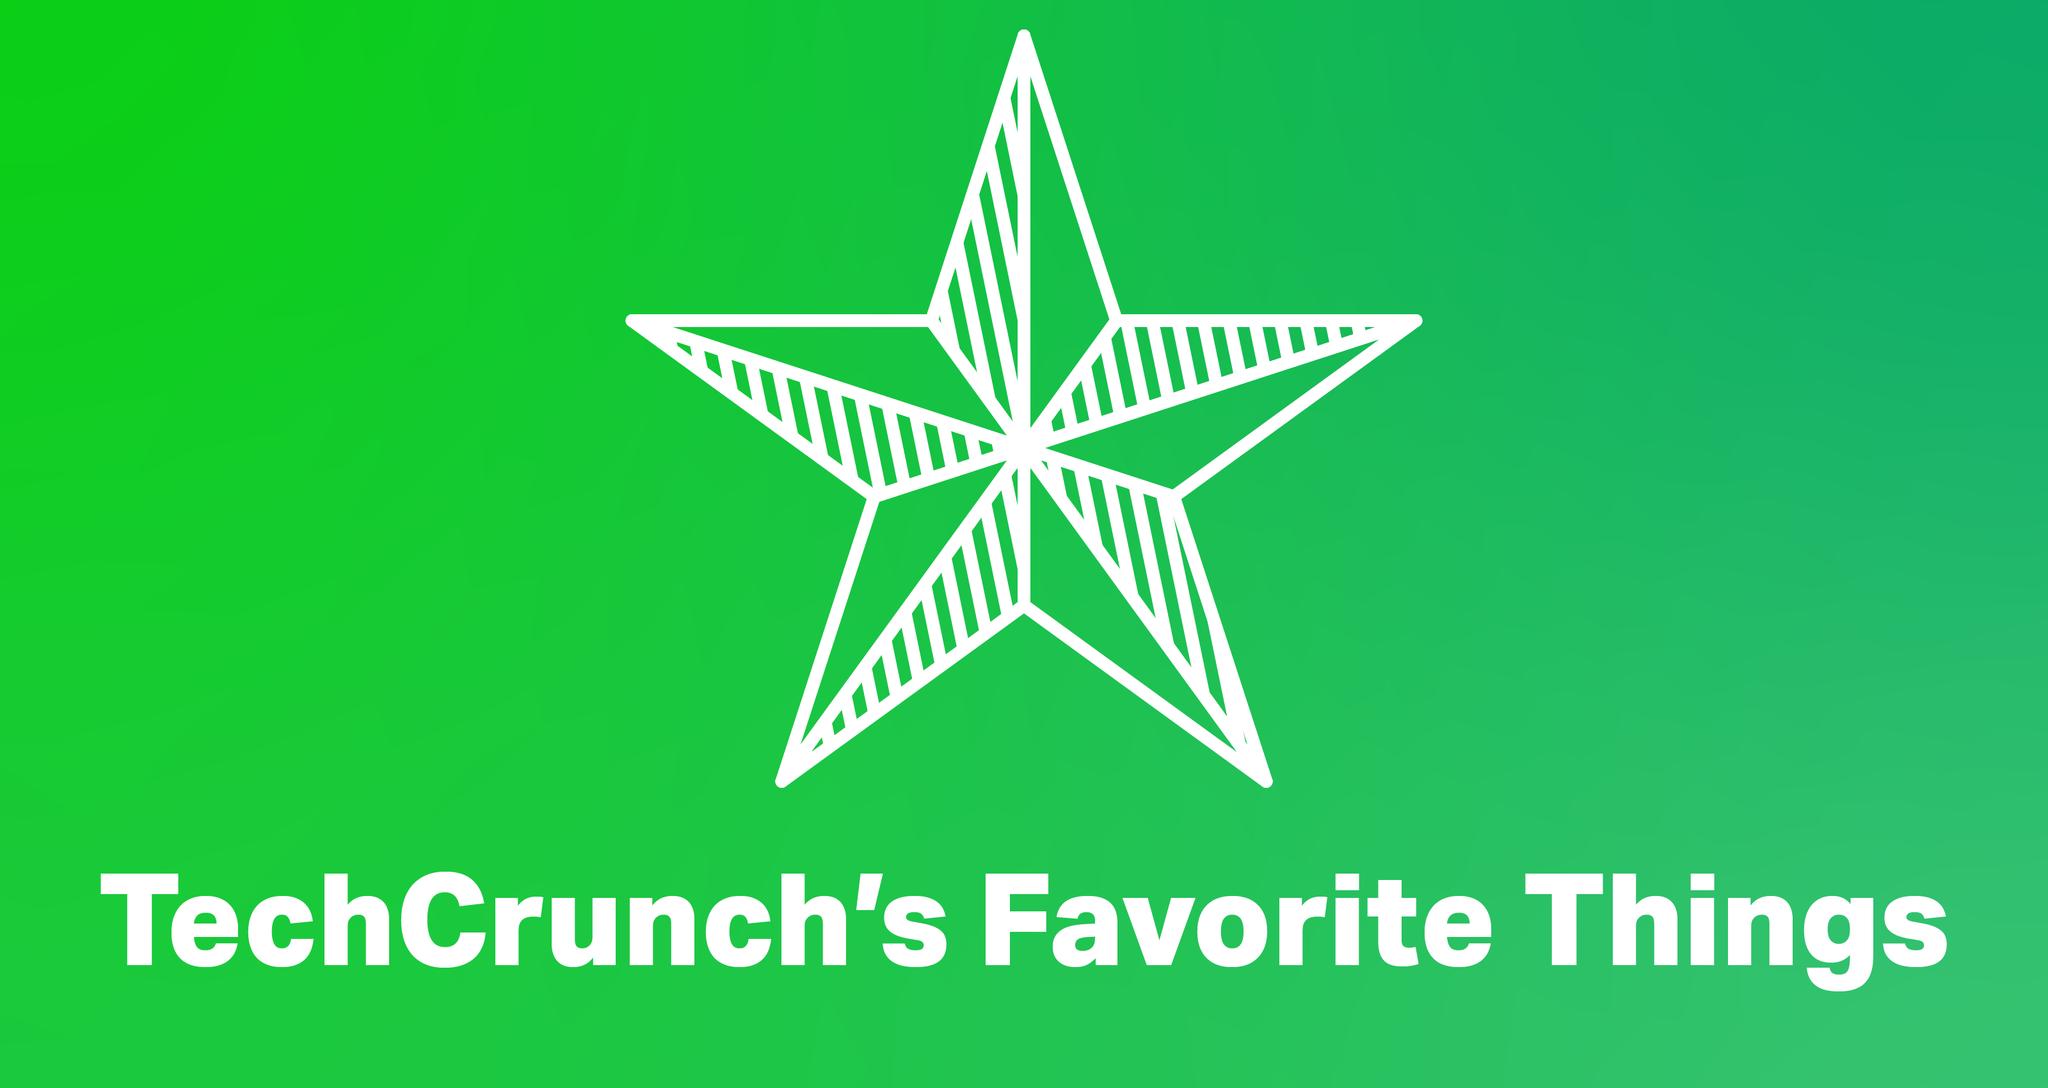 TechCrunch's Favorite Things of 2018 | TechCrunch